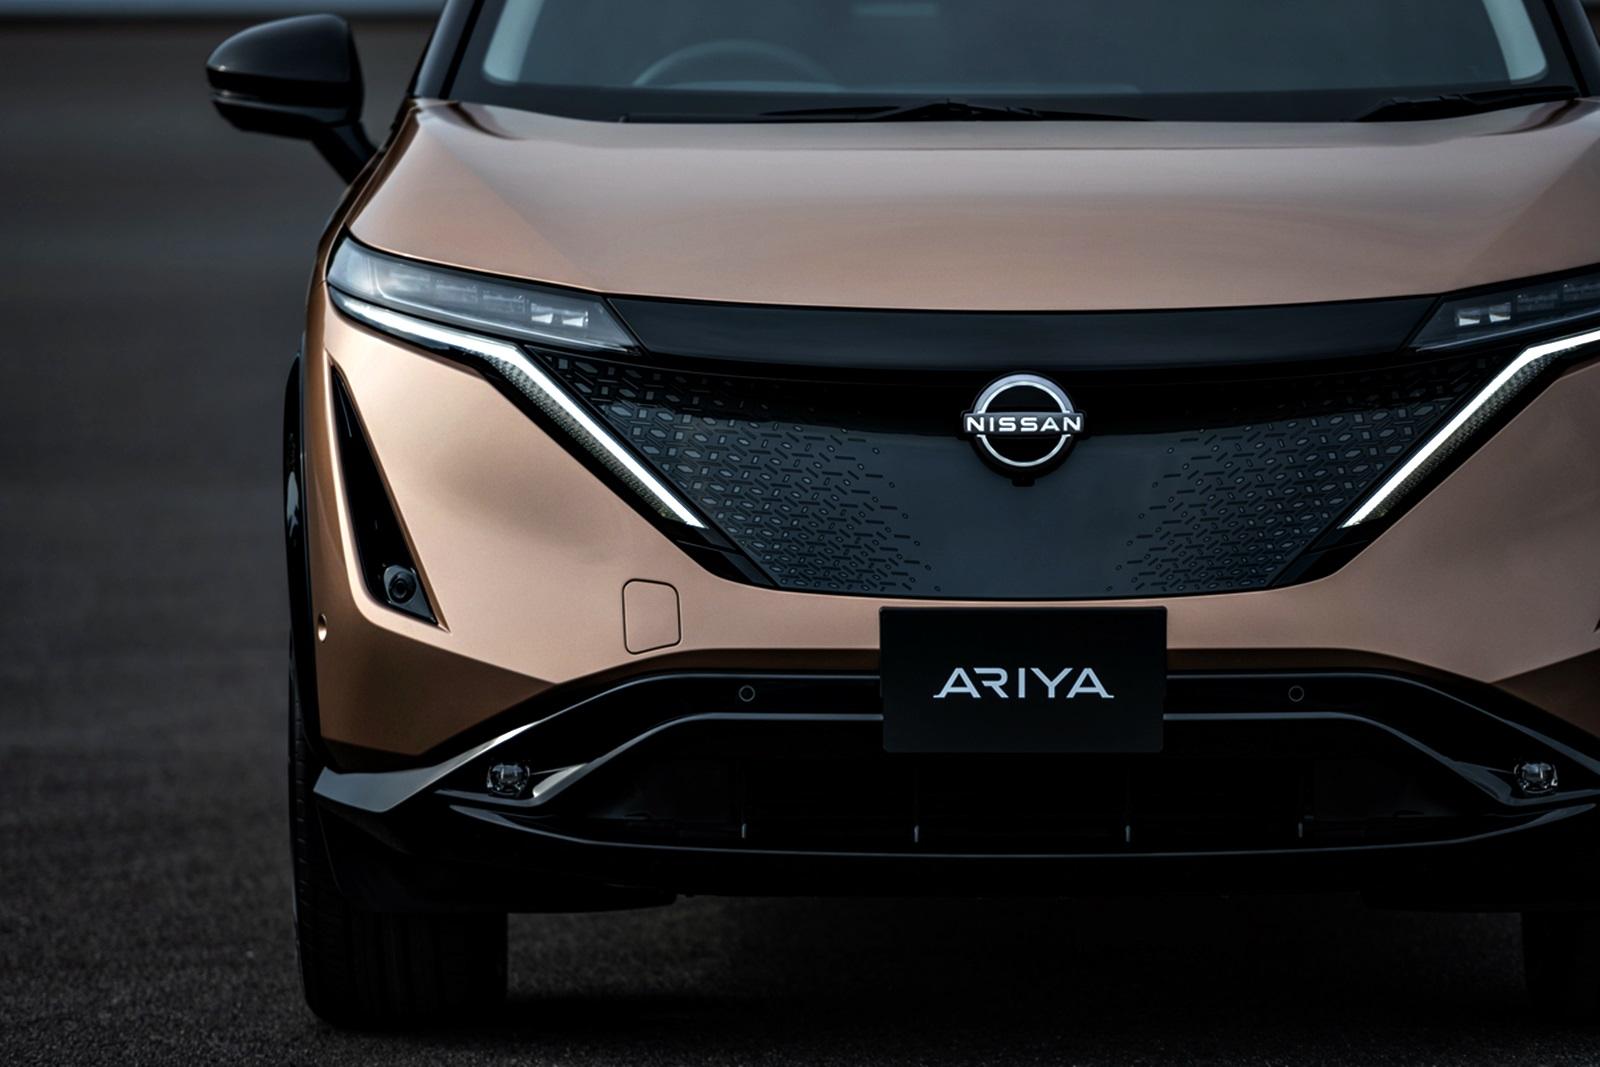 Nissan Ariya (7)